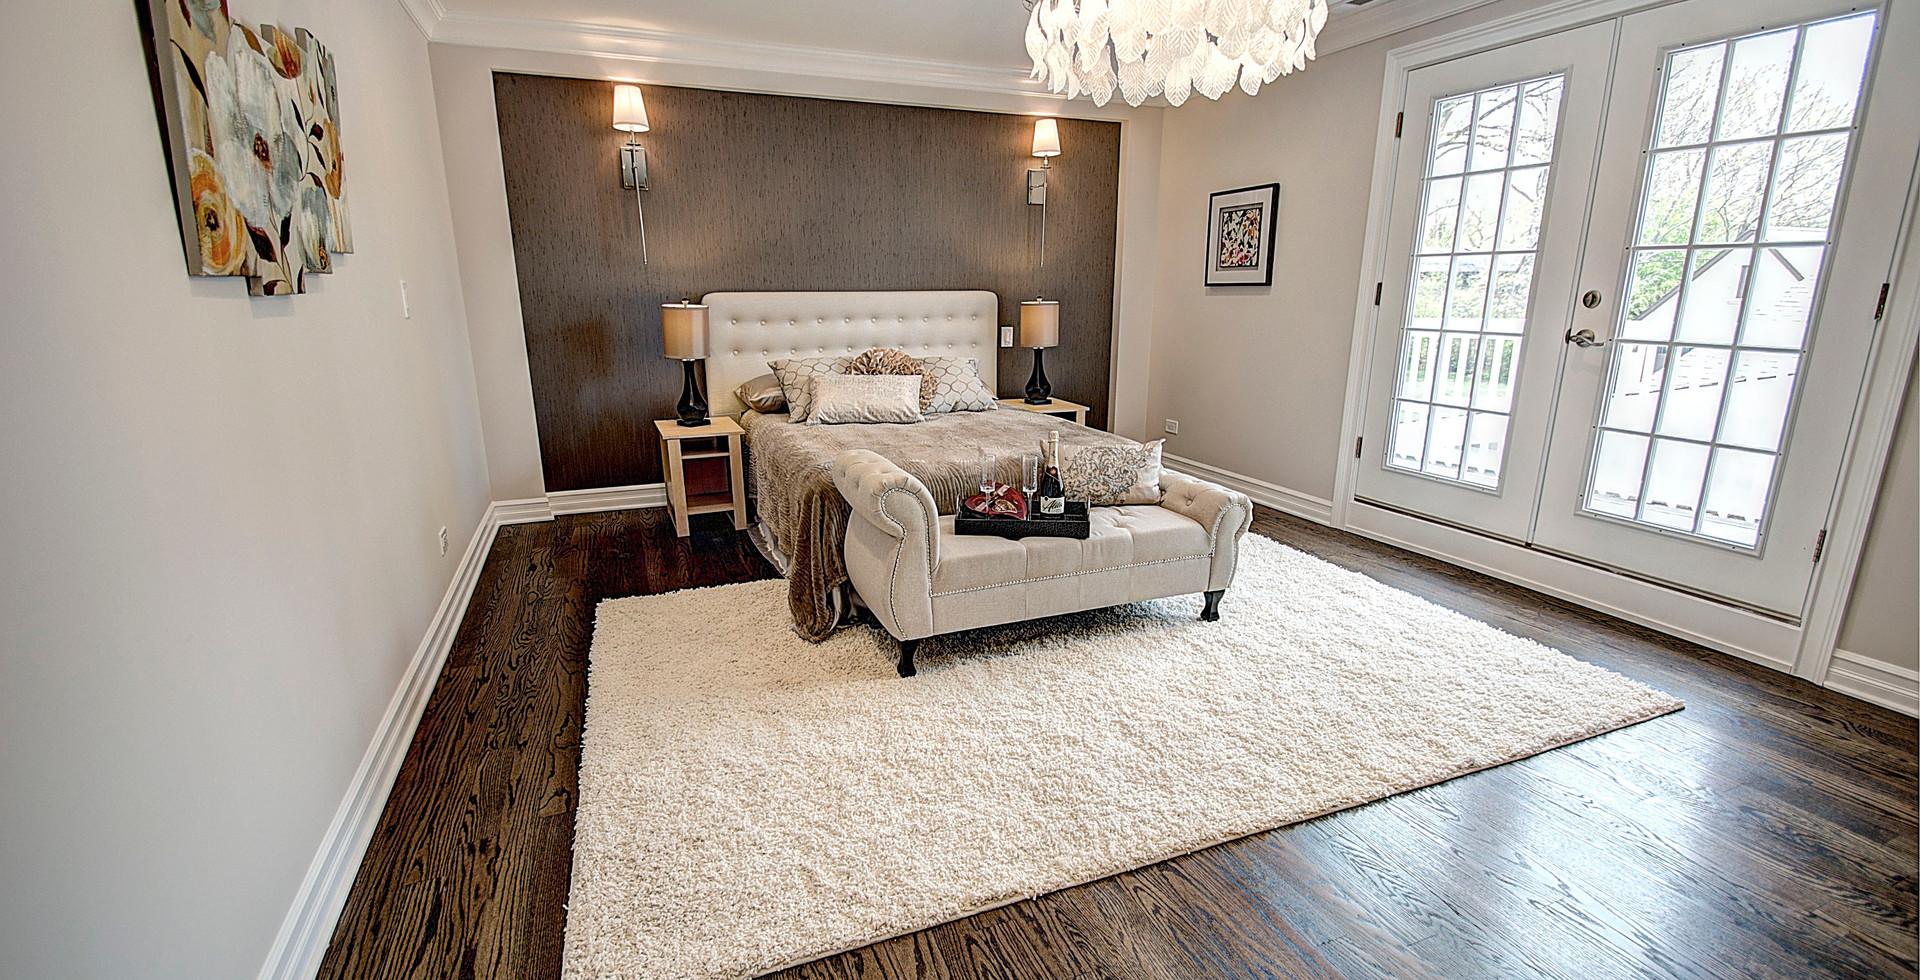 Bedroom in La Grange designed by MRM Home Design.jpg